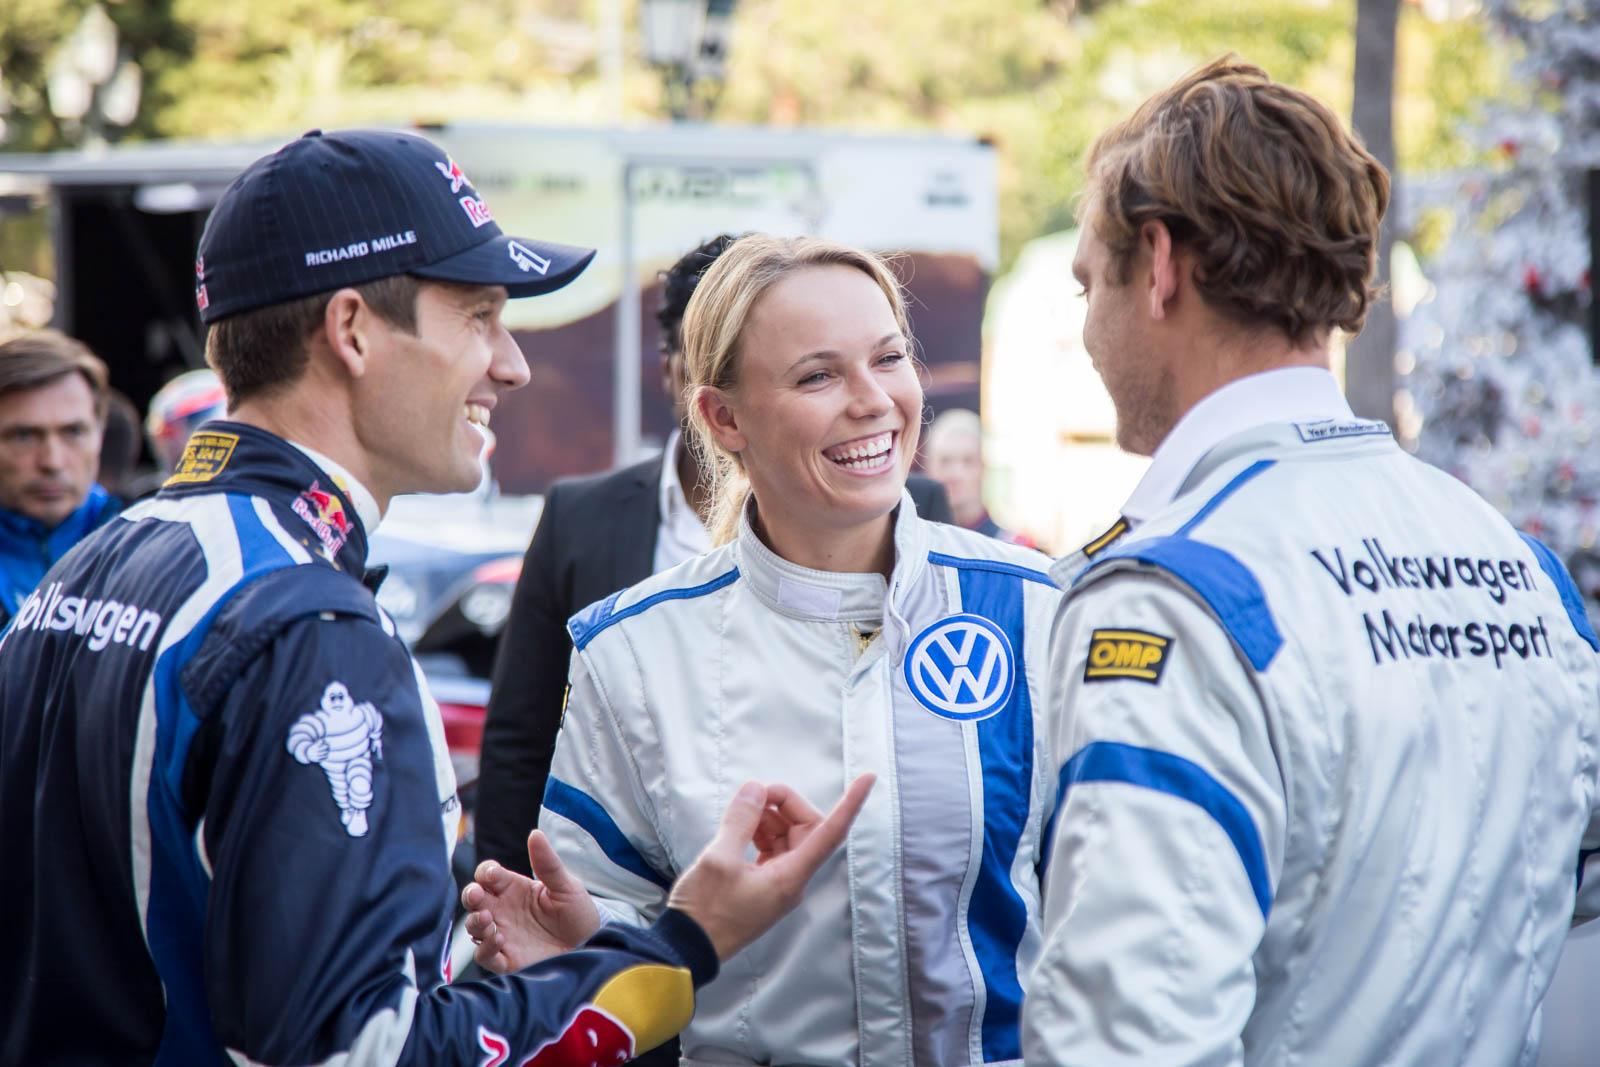 © Ivan Blanco - Rallye Monte-Carlo 2016, Monaco, Rally, WRC, World Rally Championship, Sebasten Ogier